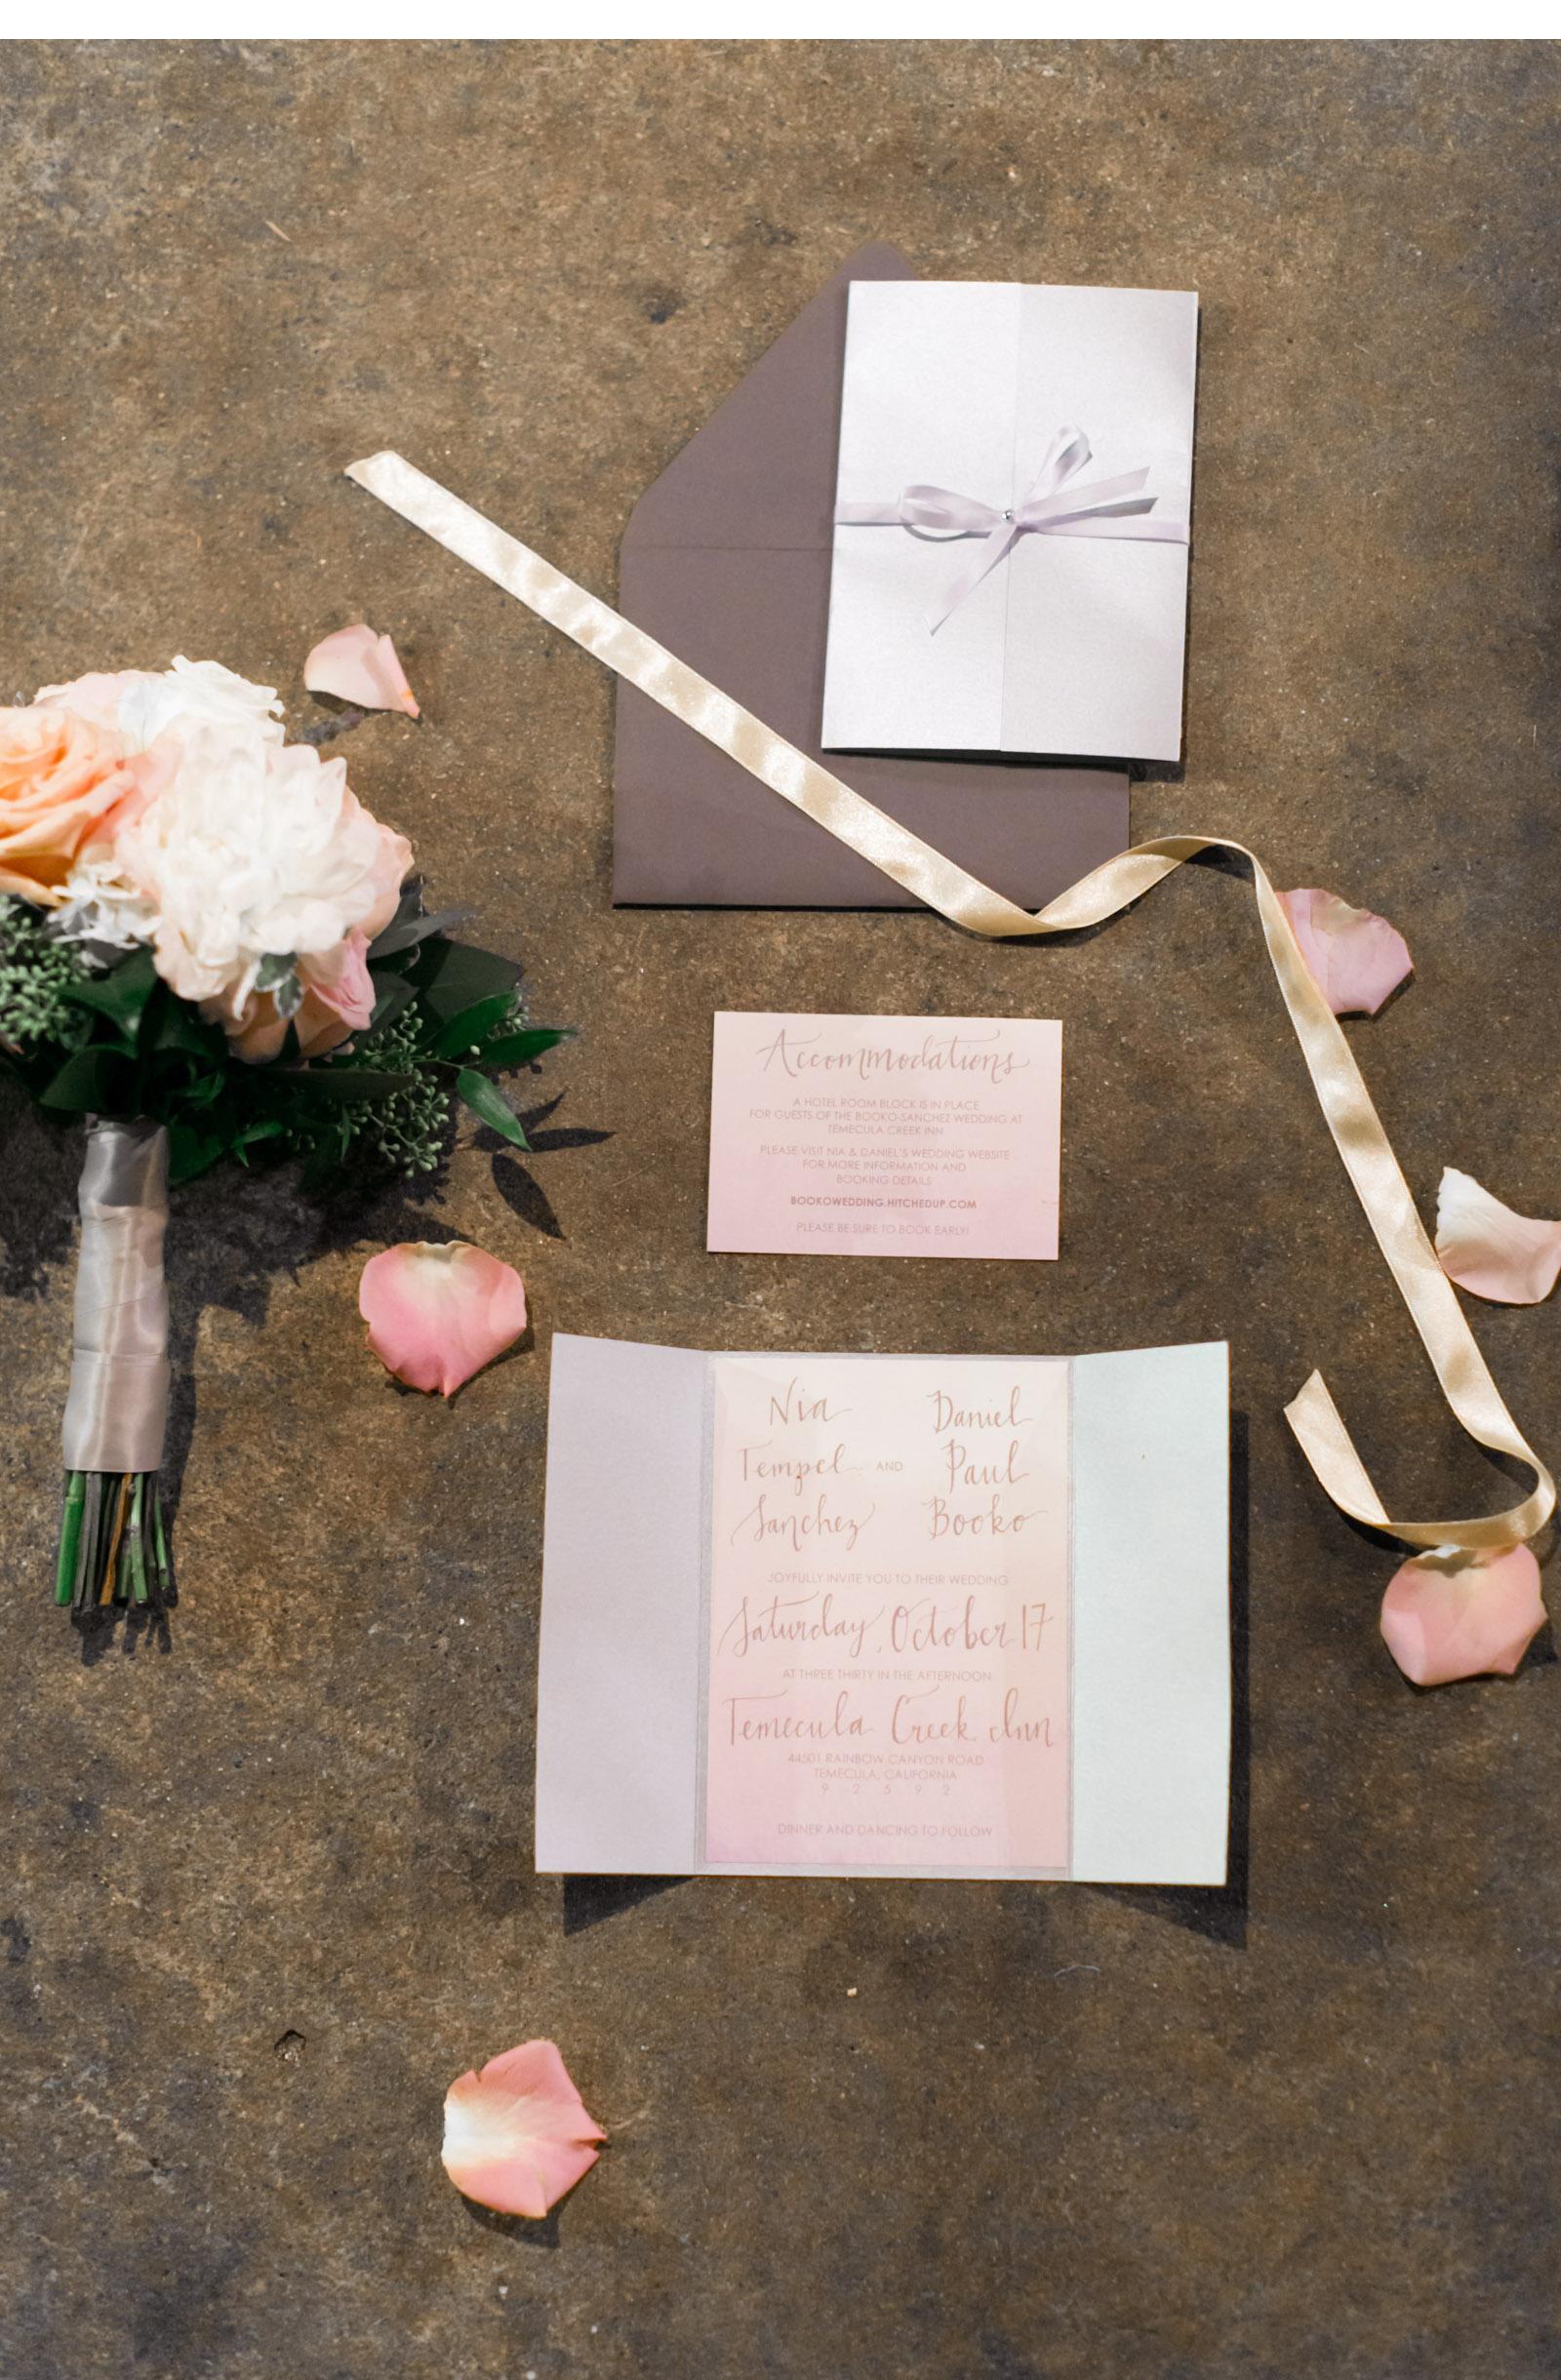 Nia-&-Daniel-Booko-Wedding-Natalie-Schutt-Photography_03.jpg